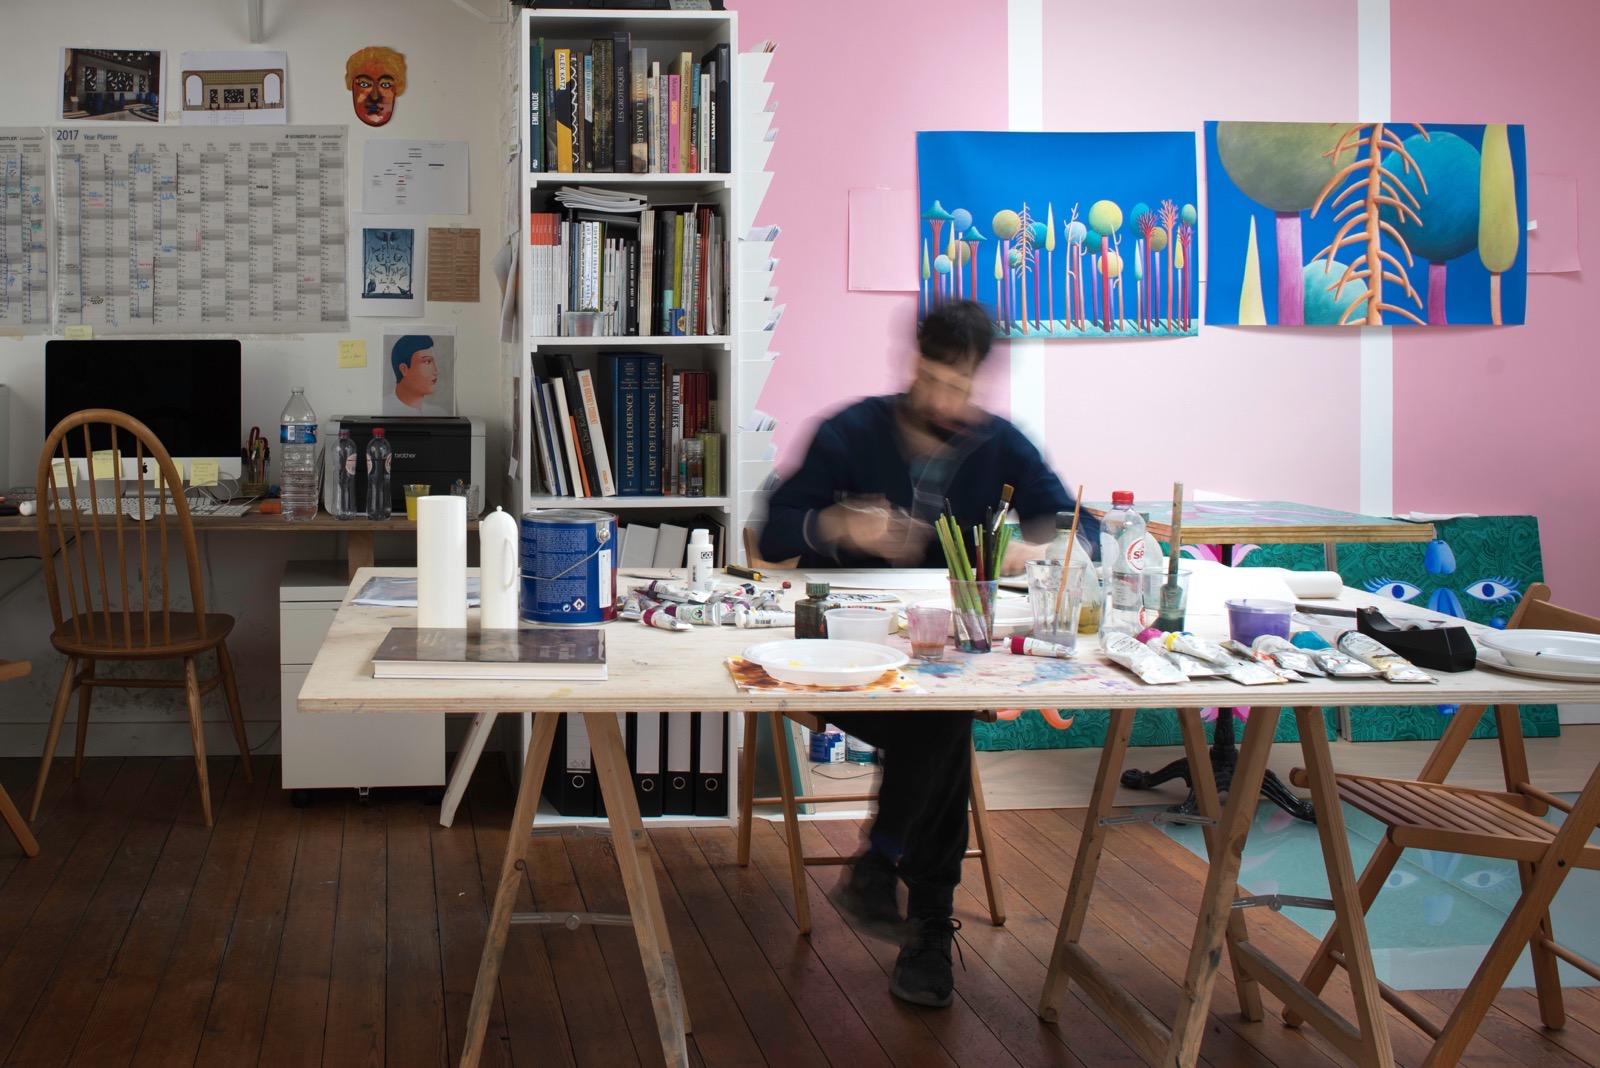 Nicolas Party working in the studio